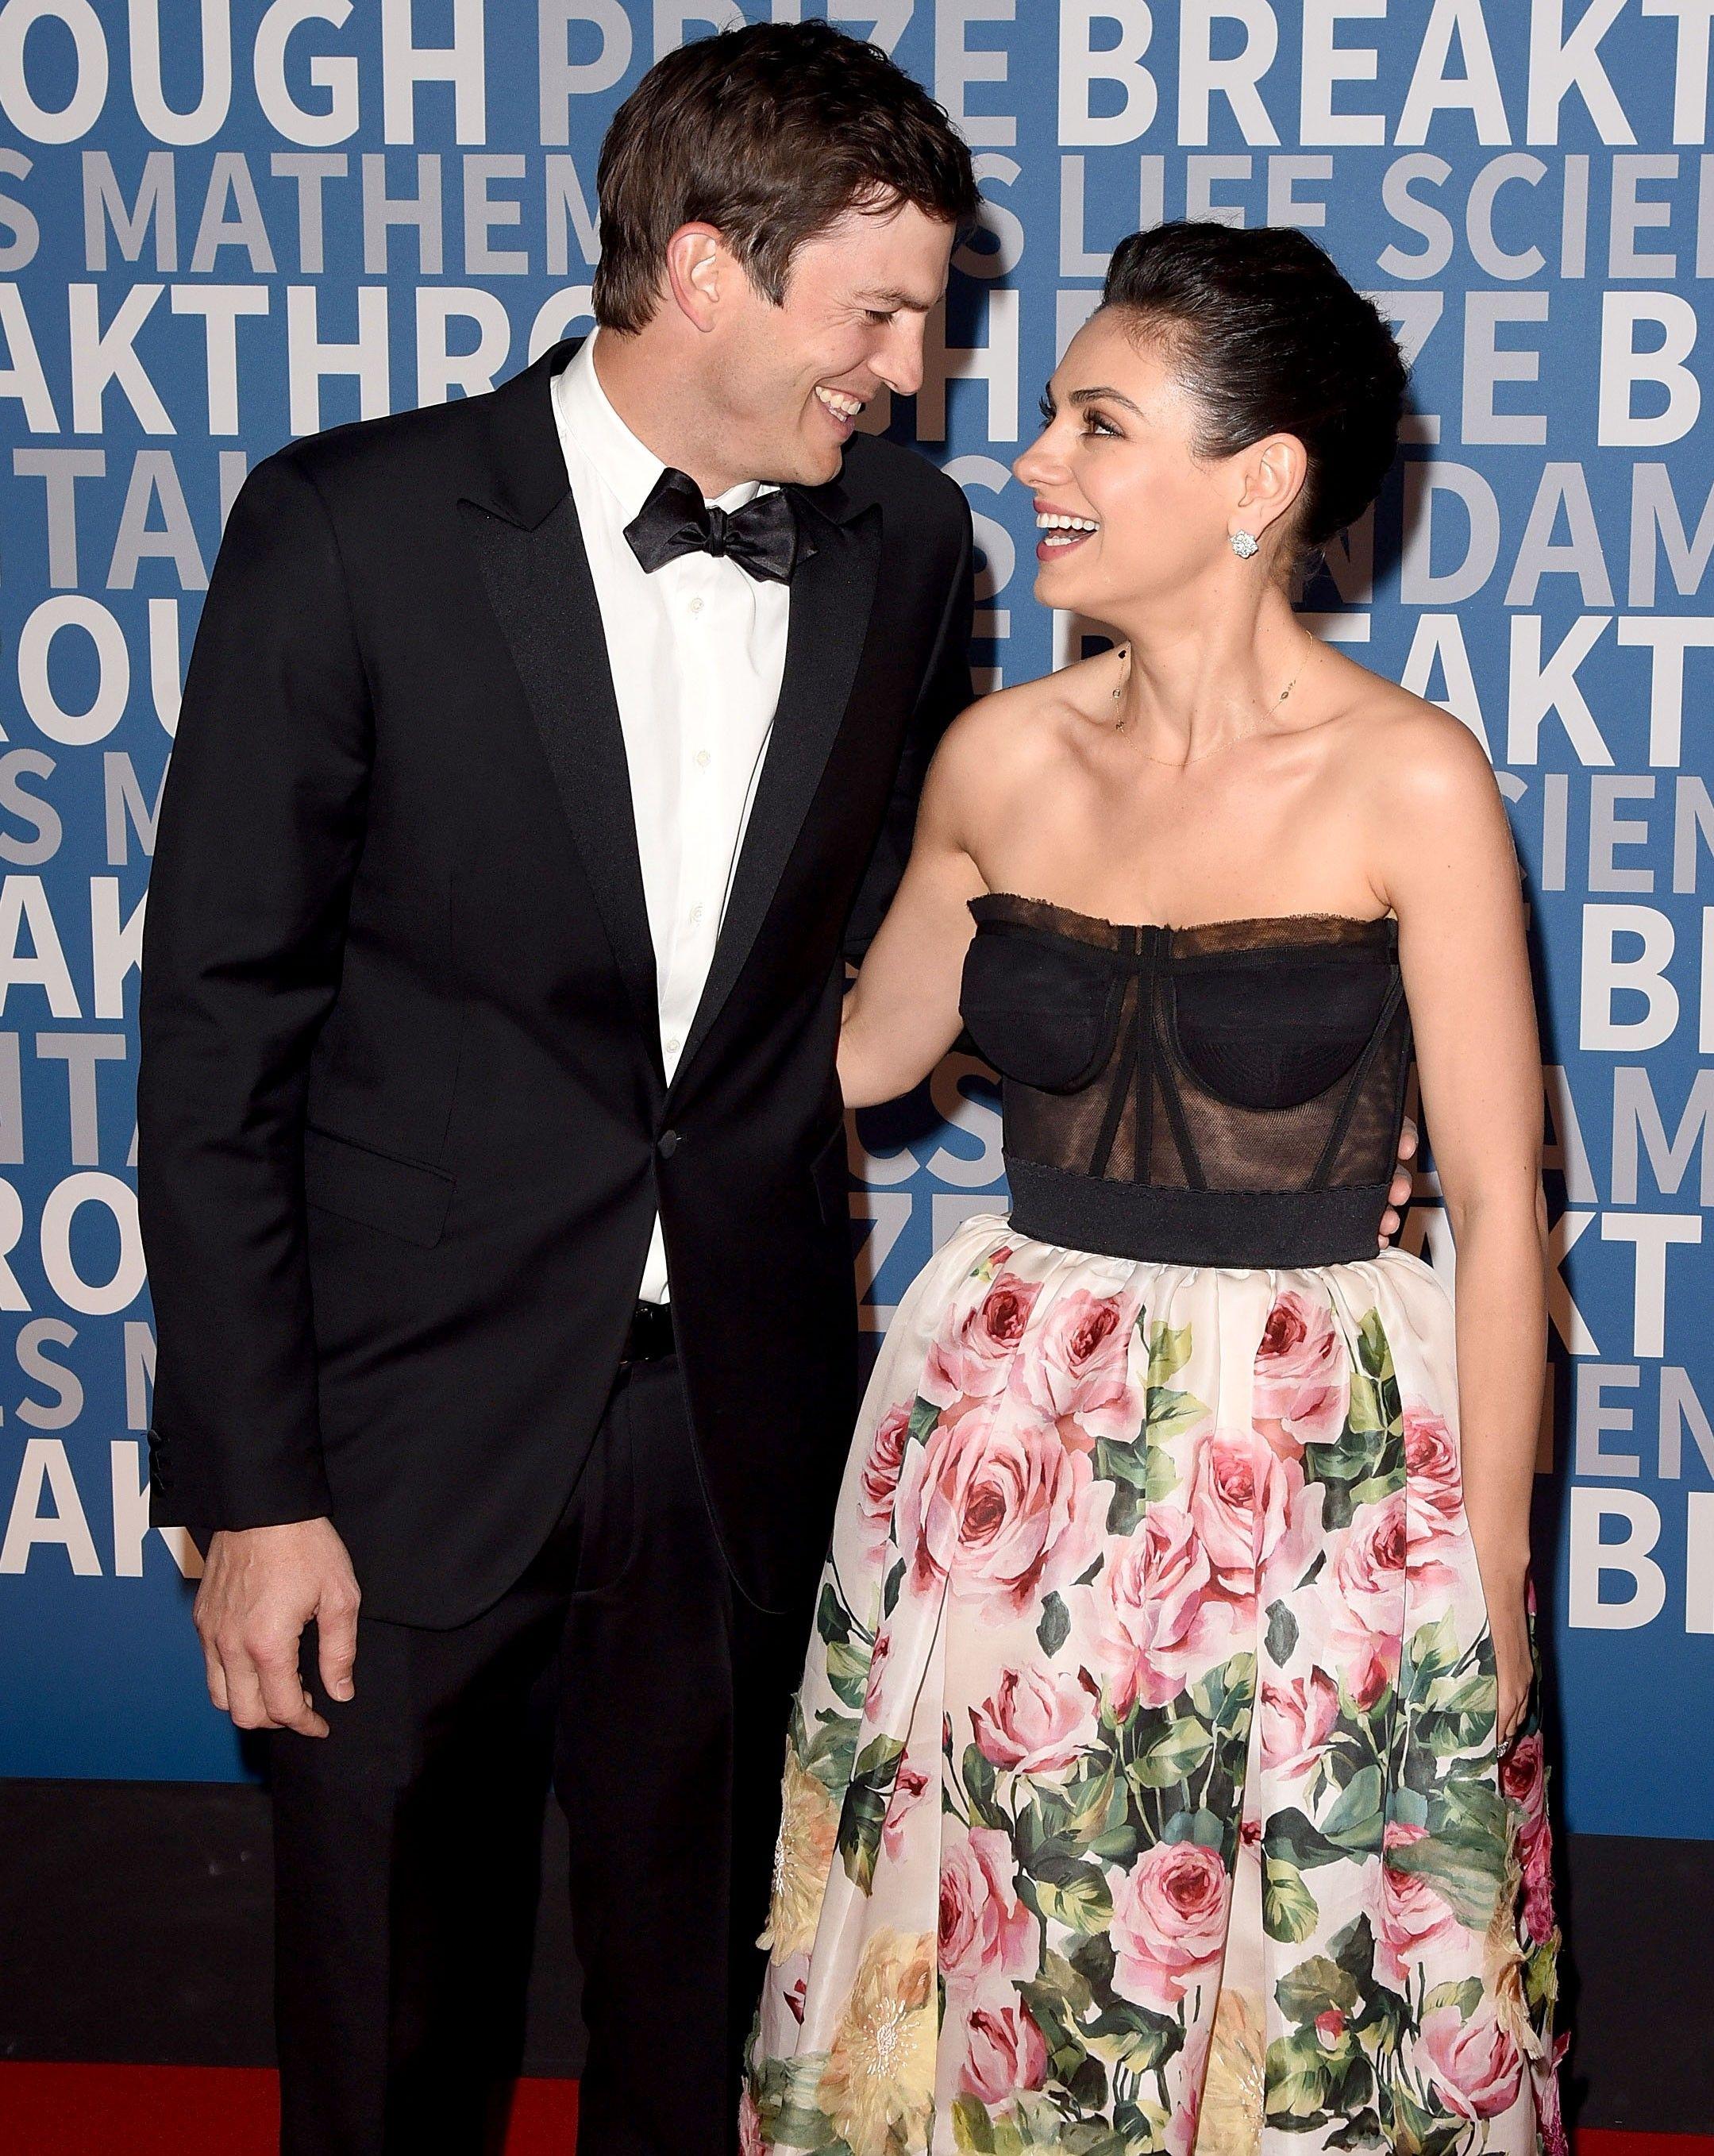 Mila Kunis And Ashton Kutcher S Wedding Day In Oak Glen California July 2015 Bridesmaid Dresses Wedding Dresses White Dress